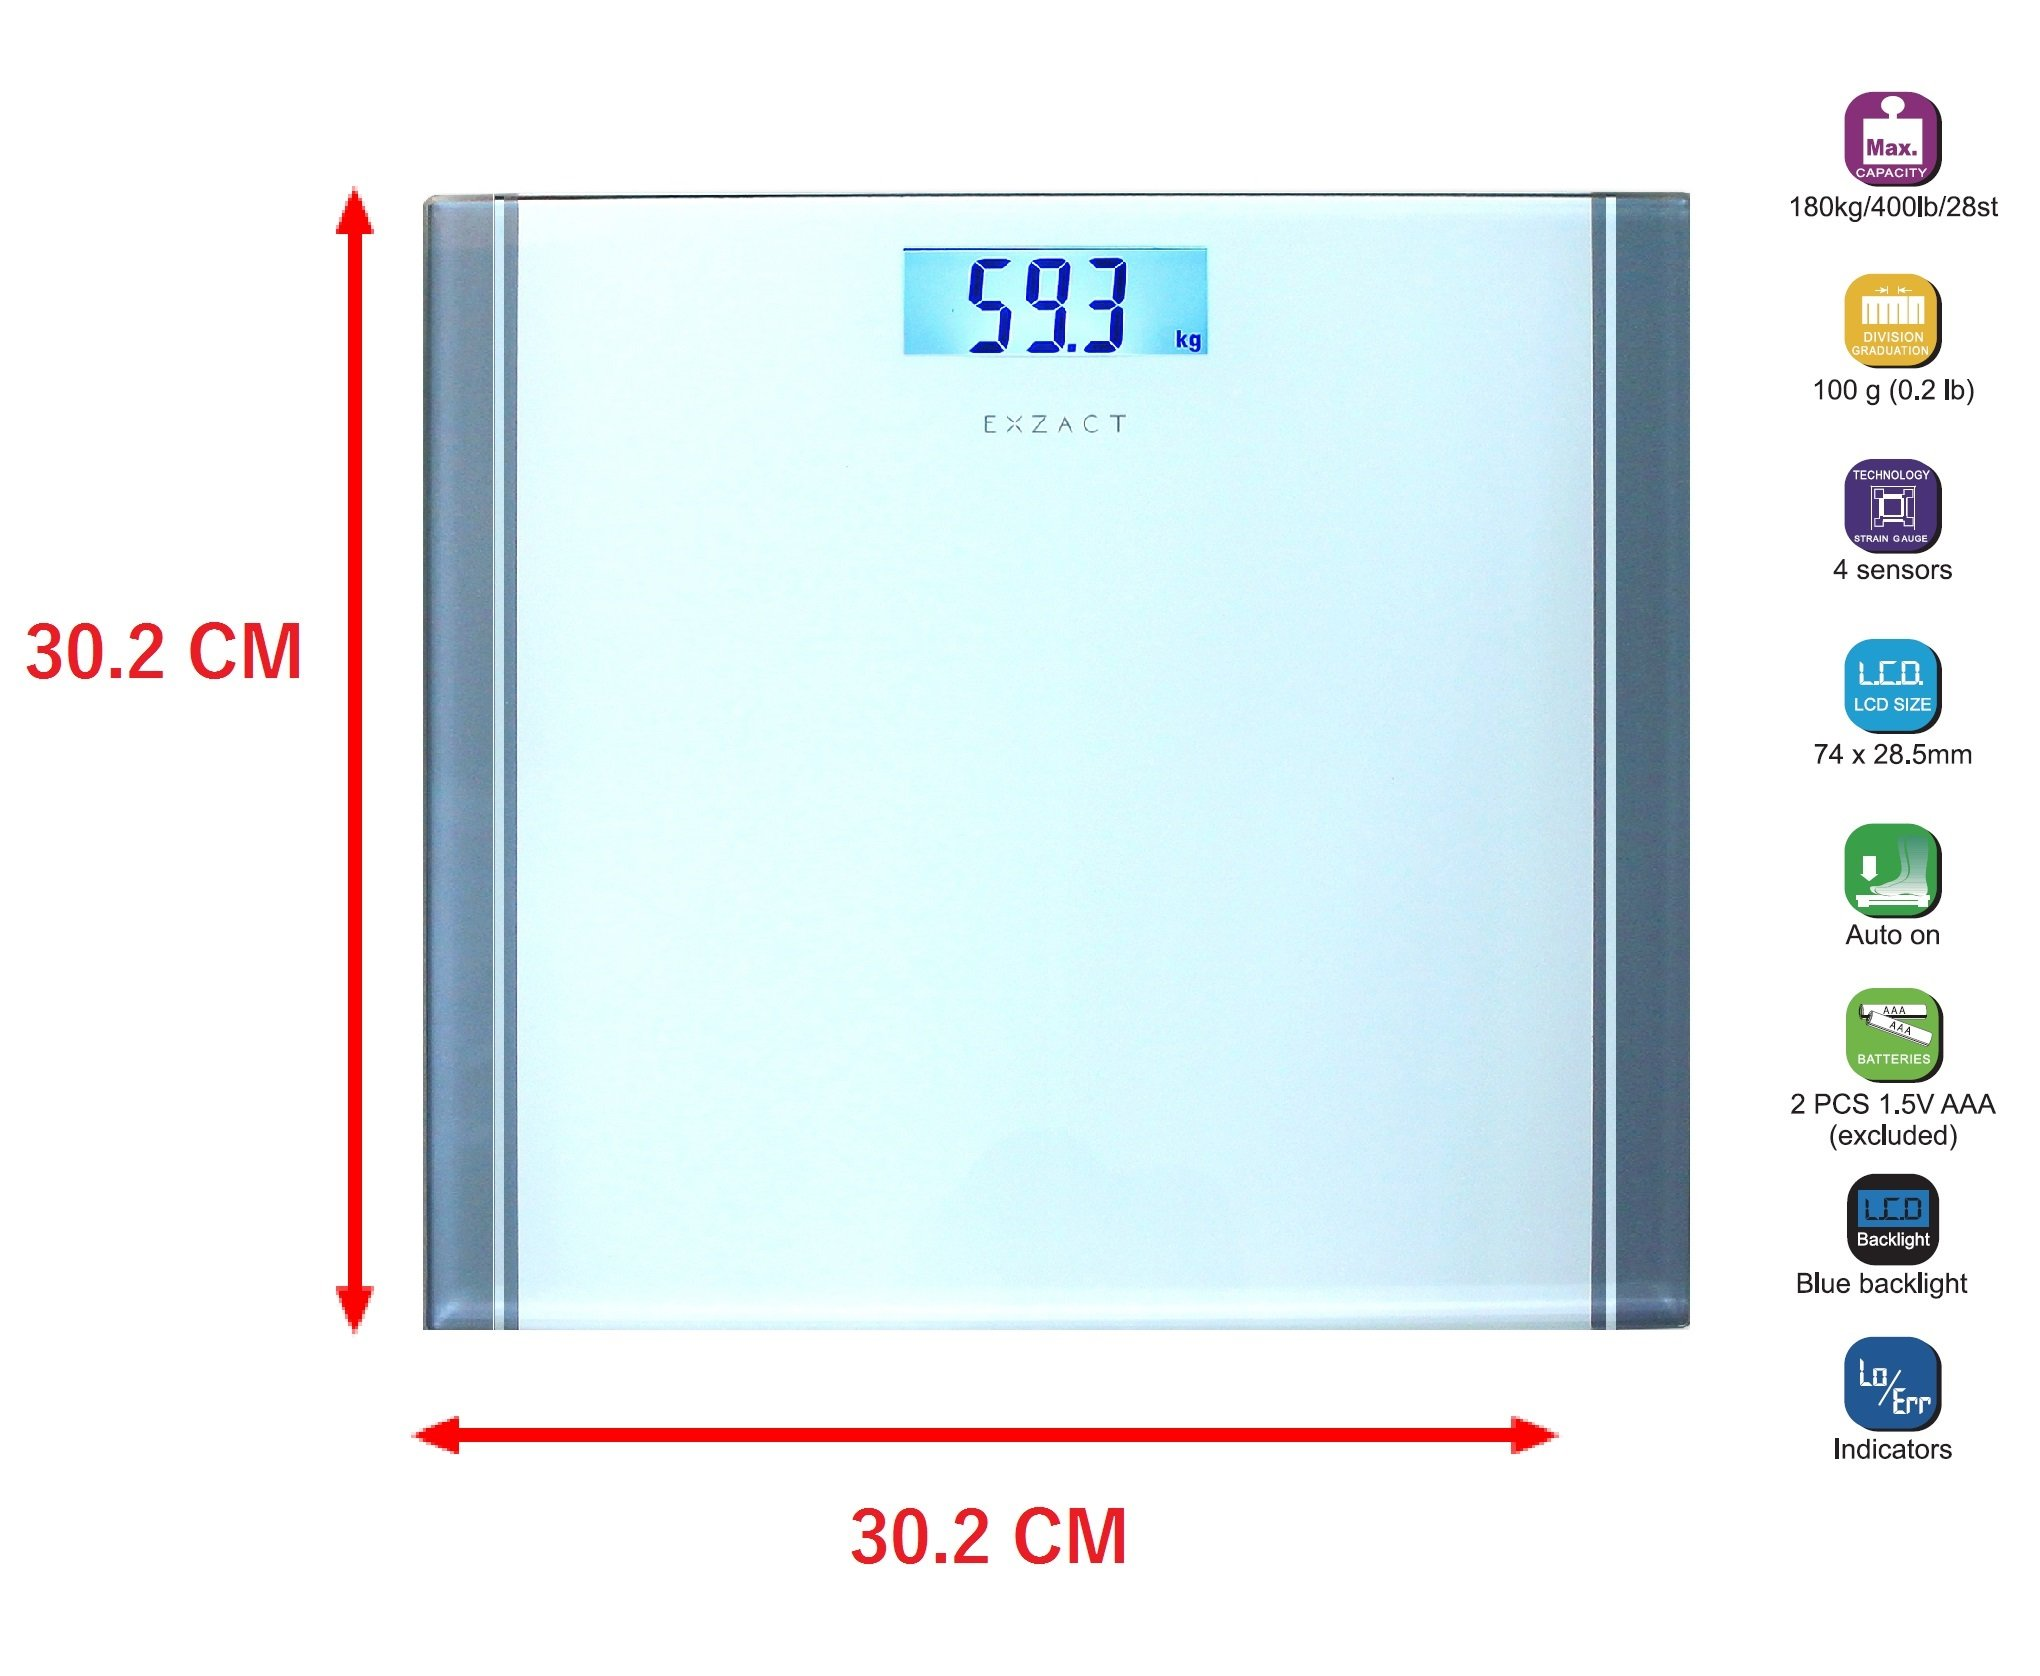 71Dl35b7dNL - Exzact - Báscula Corporal Electrónica/Báscula de Baño Digital/Escala Personal -Capacidad Grande 180kg / 400lb / 28st